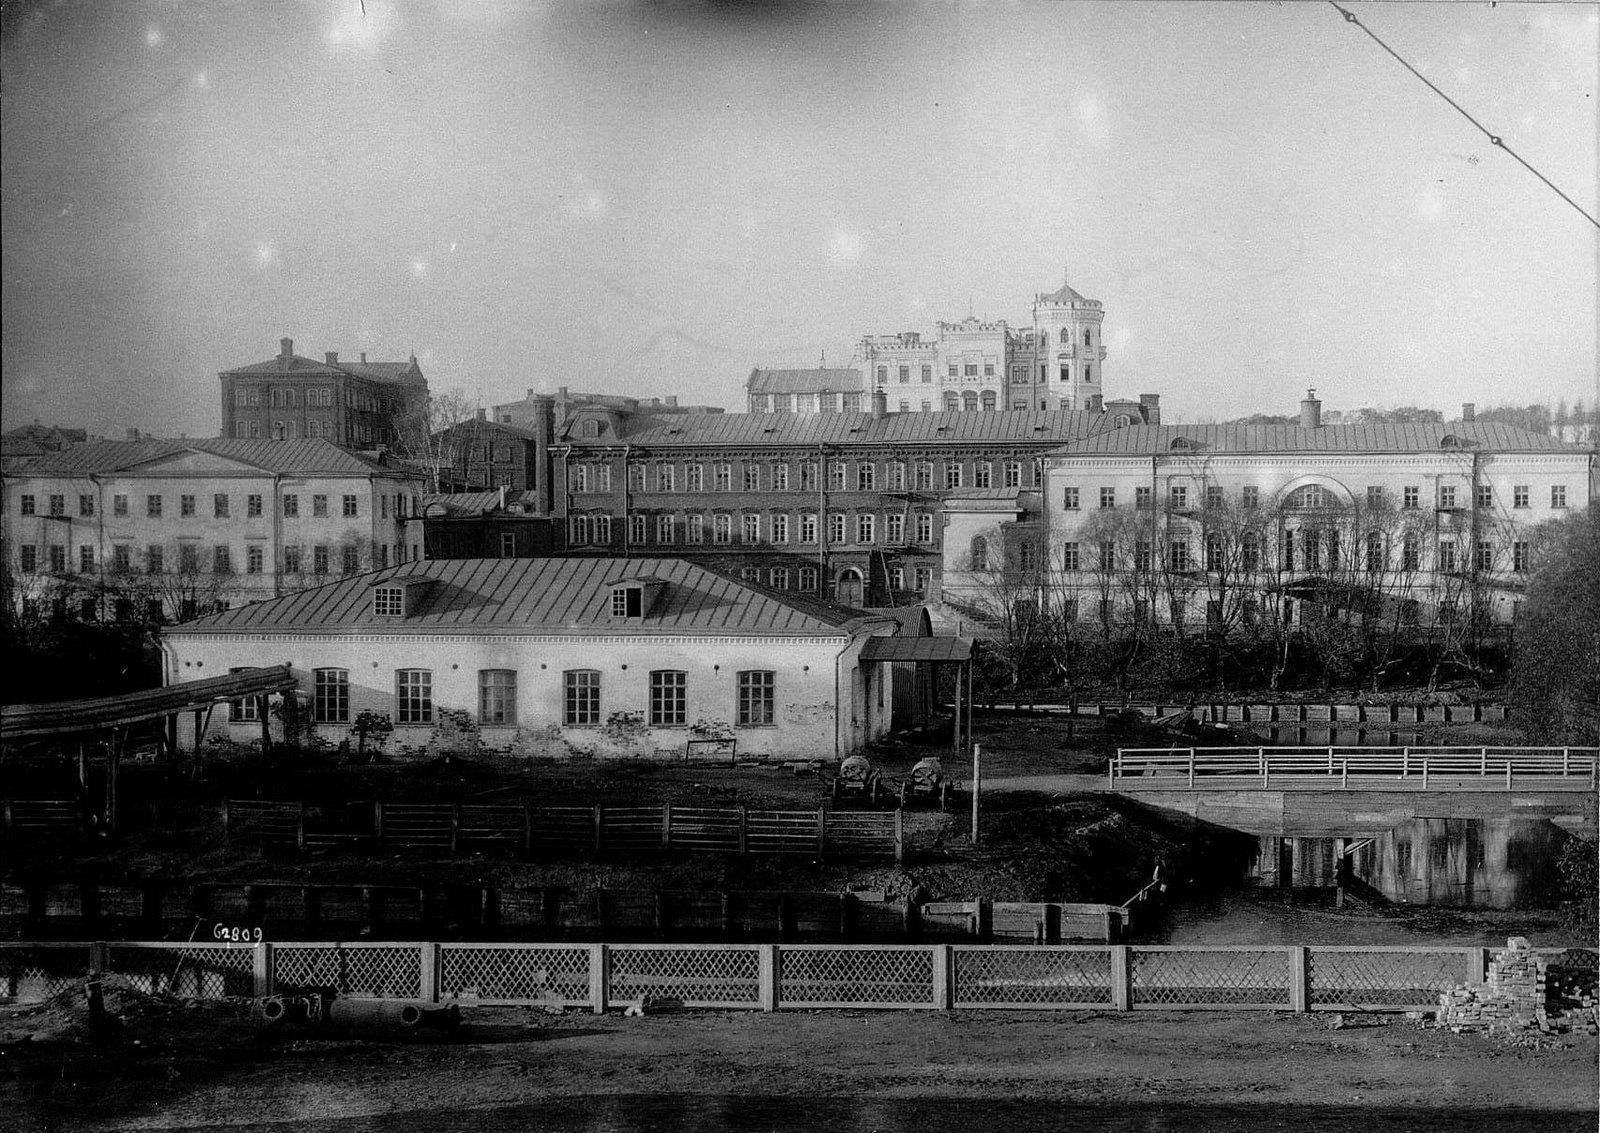 Вид фабричных зданий со двора фабрики